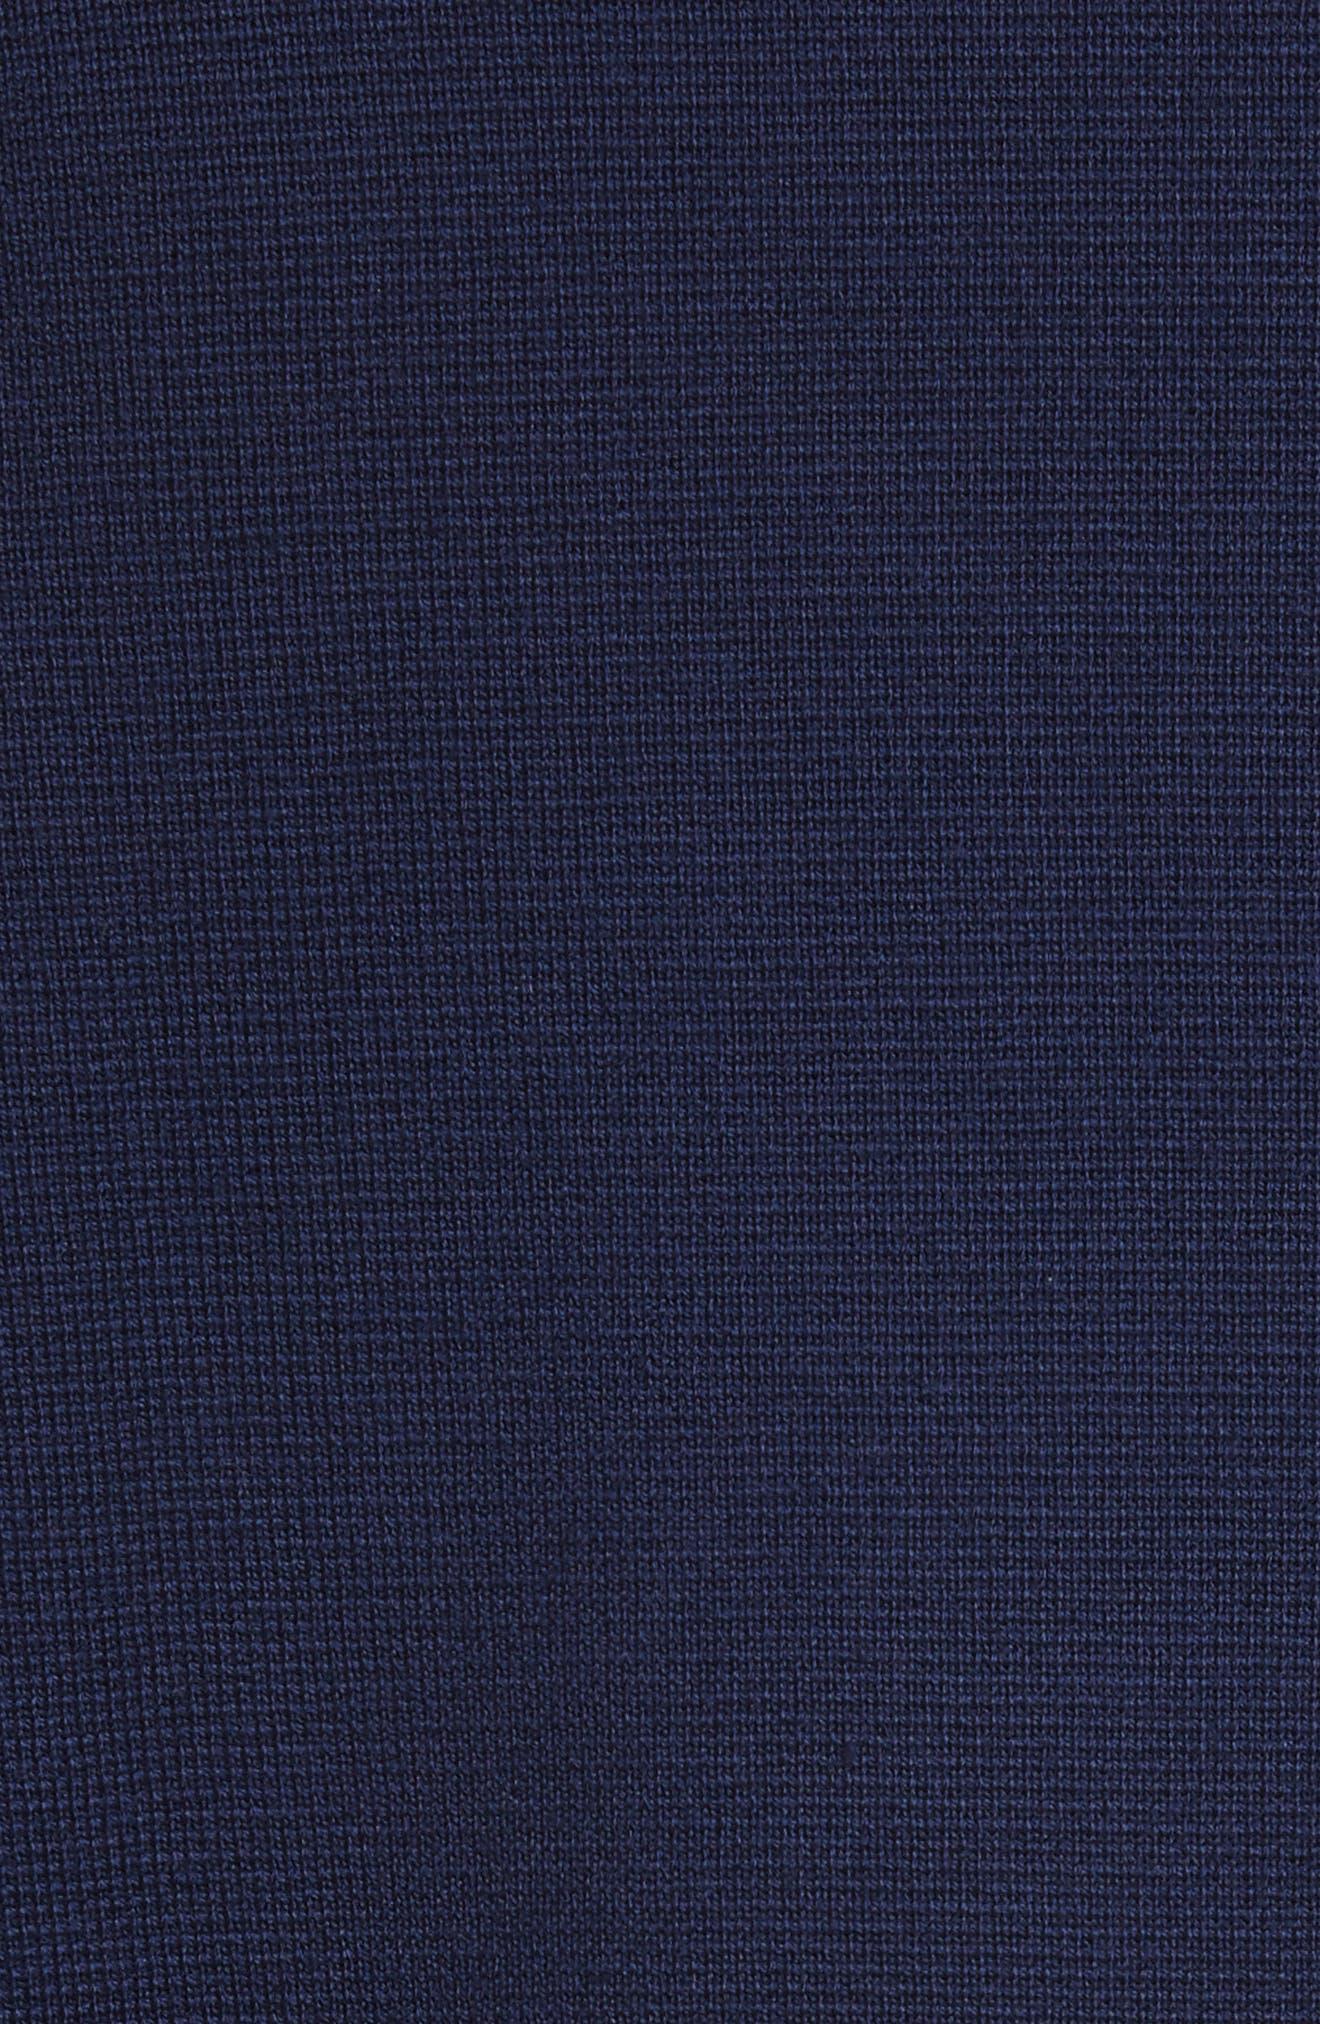 Merino Wool Blend Sweater with Shoulder Zip Trim,                             Alternate thumbnail 5, color,                             Navy